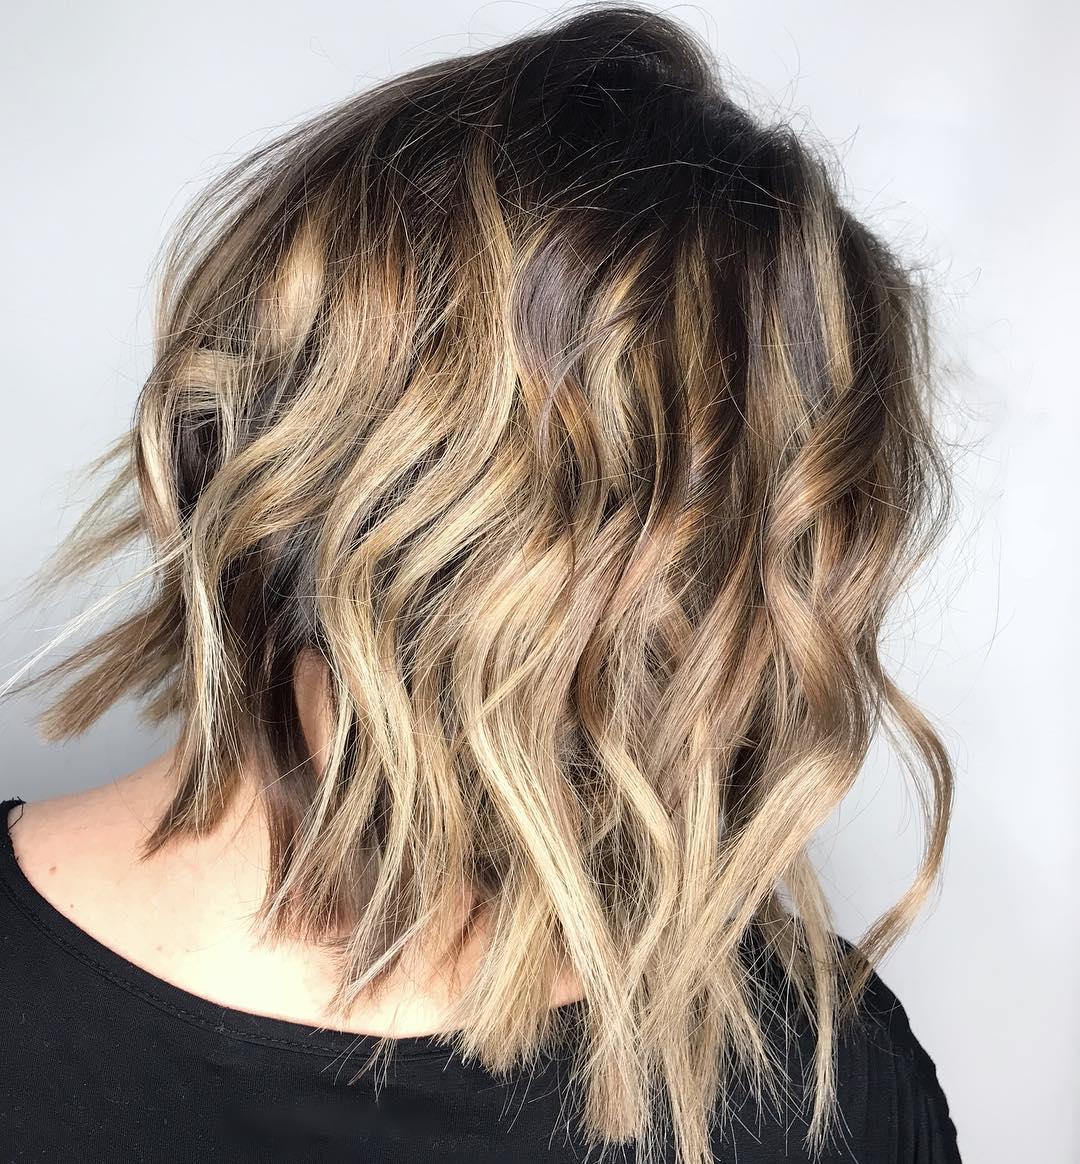 Best Brown Balayage Hair Designs for Medium Length Hair